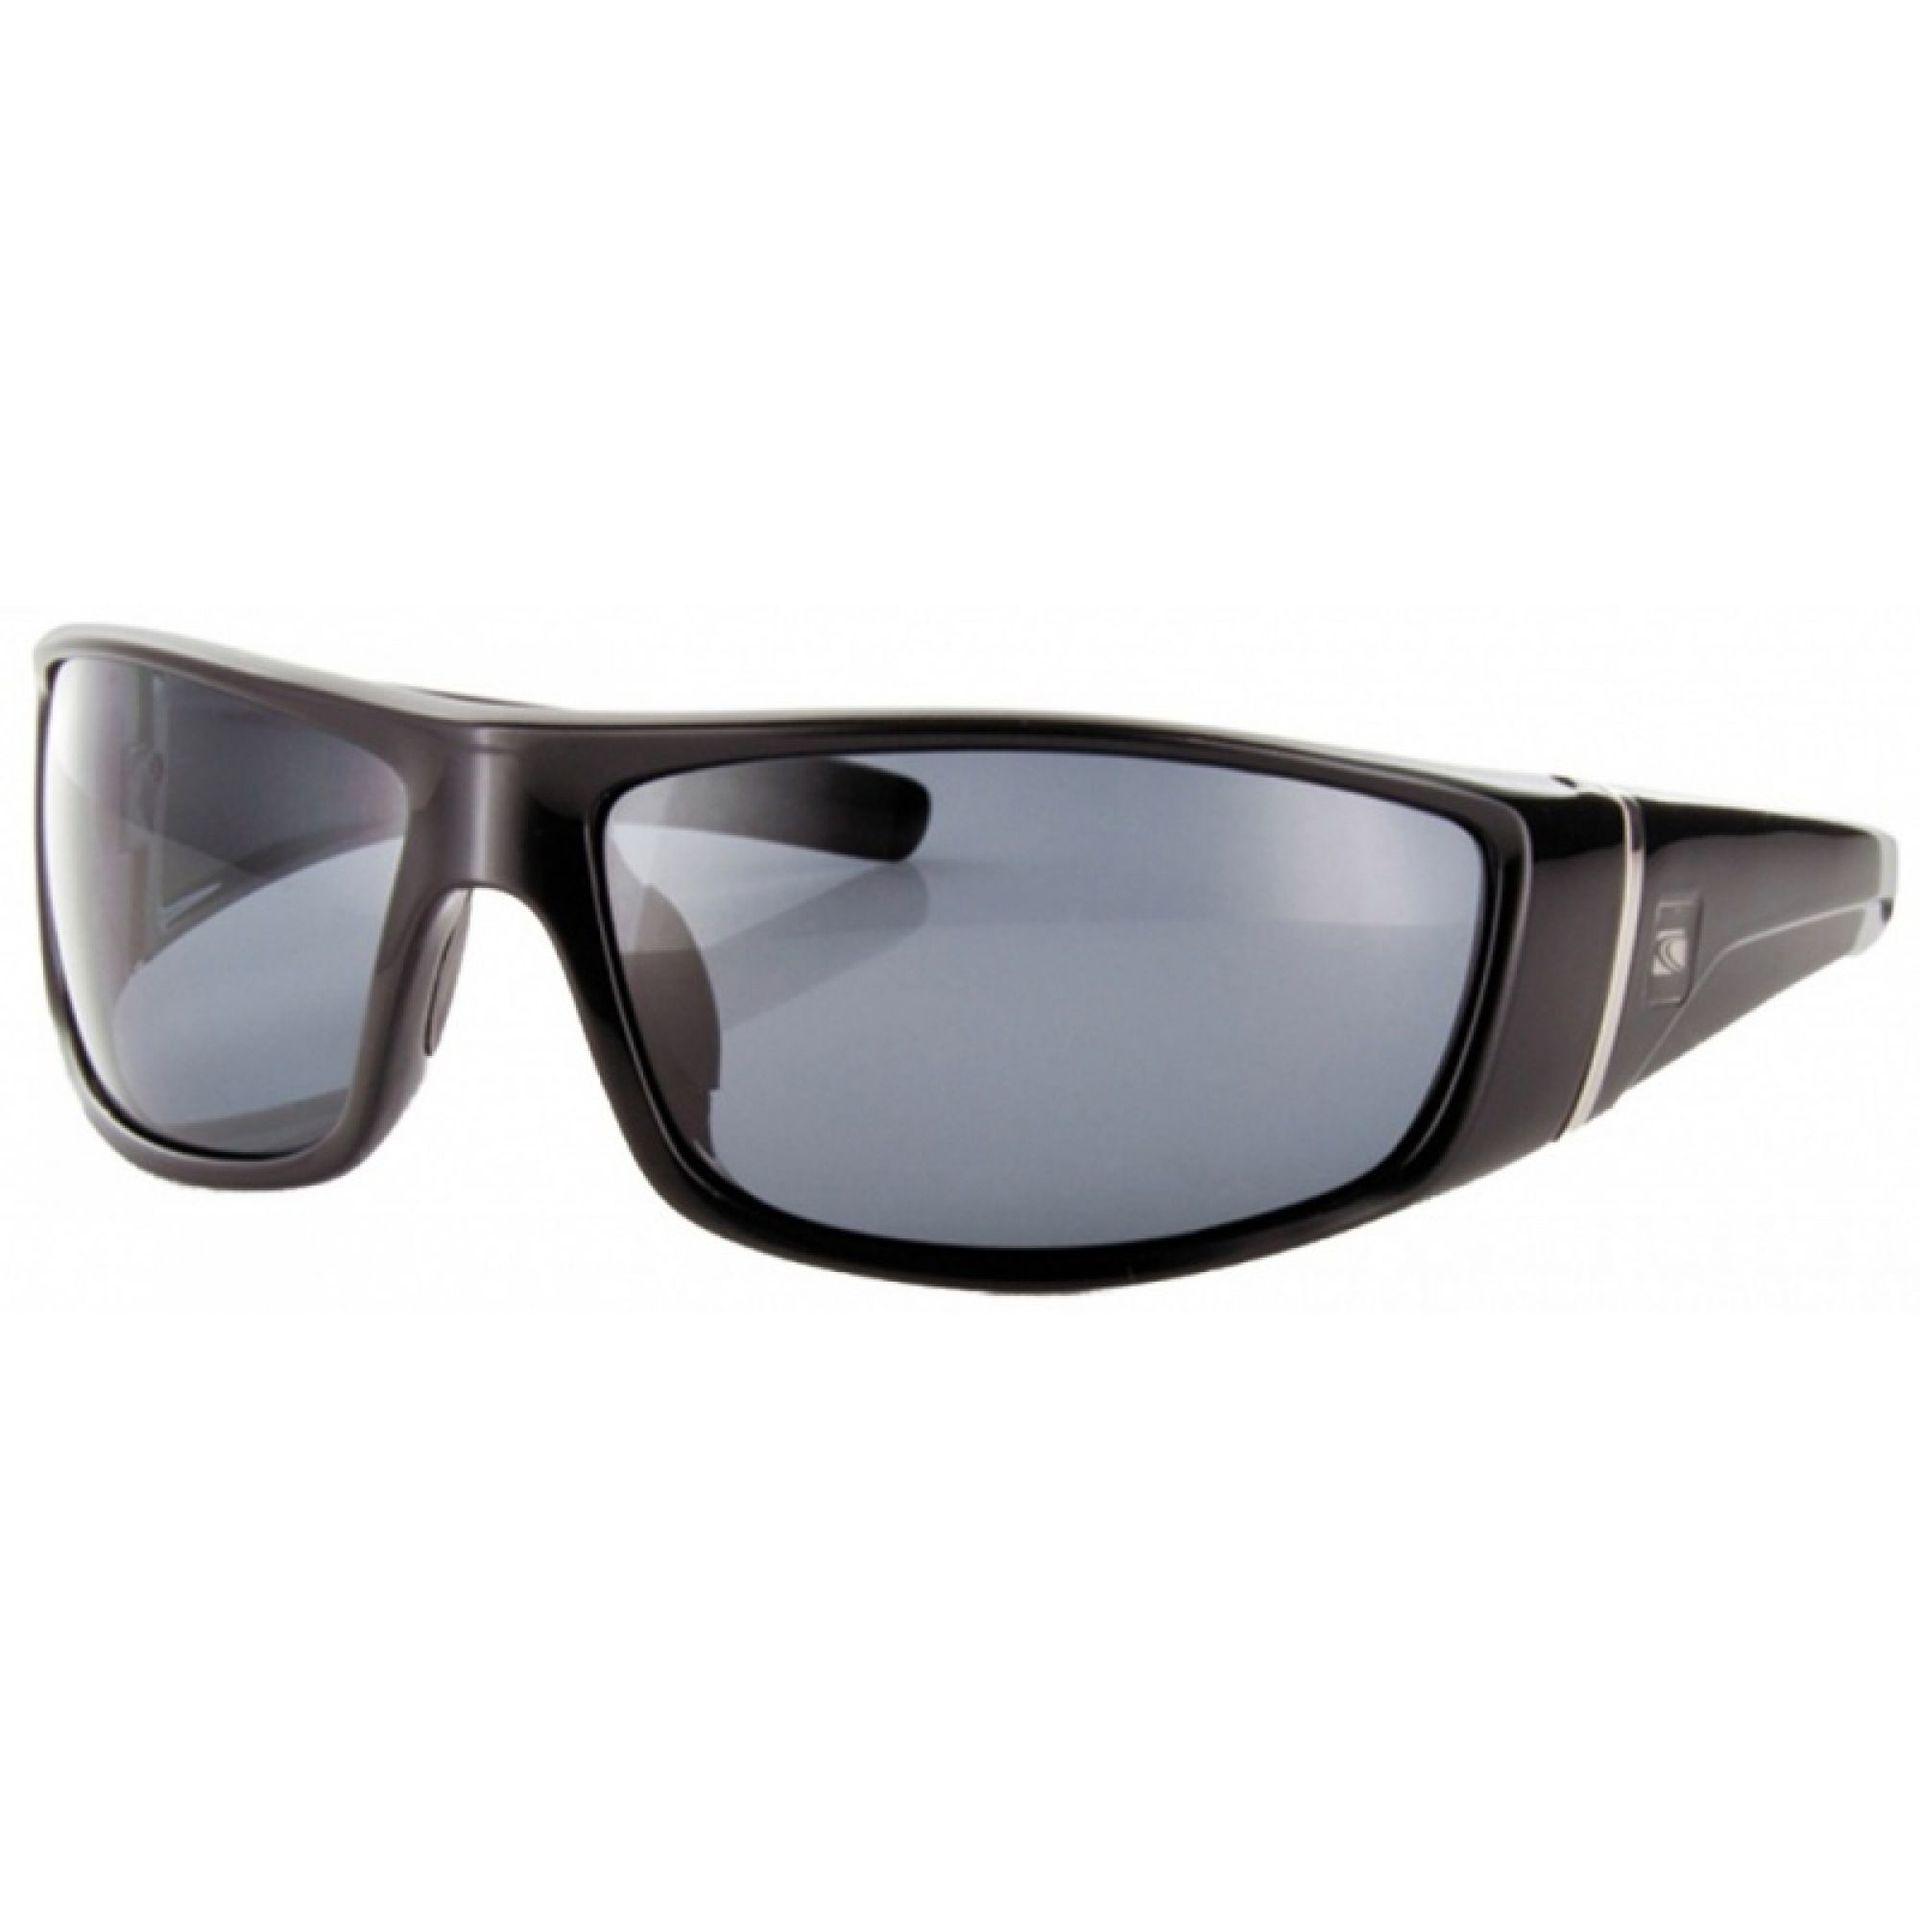 Okulary Carve DC czarne